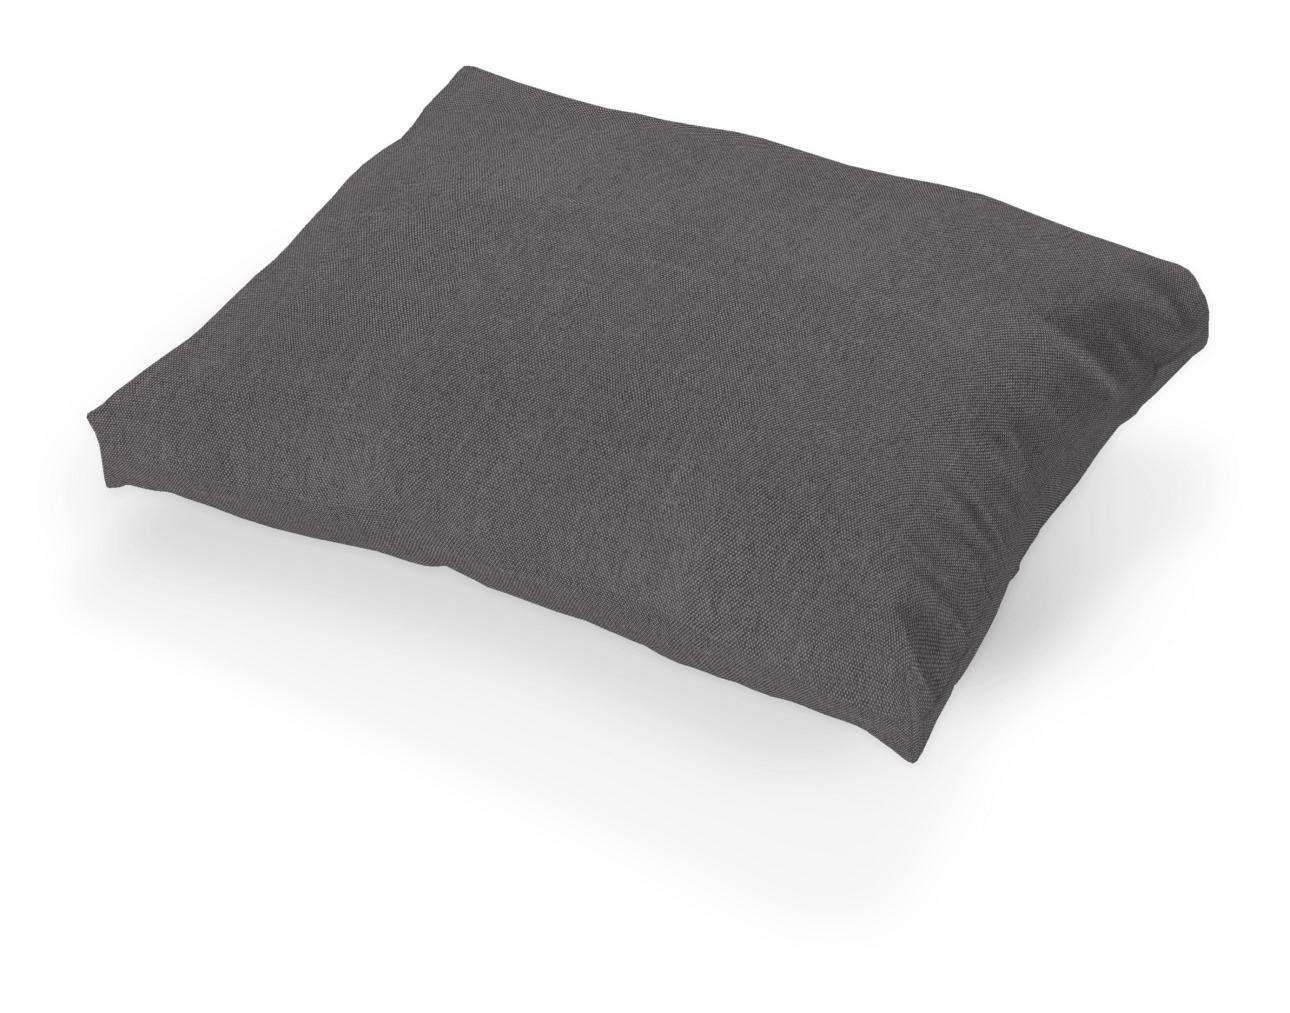 Tylösand pagalvėlės užvalkalas Tylösand pagalvėlė kolekcijoje Etna , audinys: 705-35